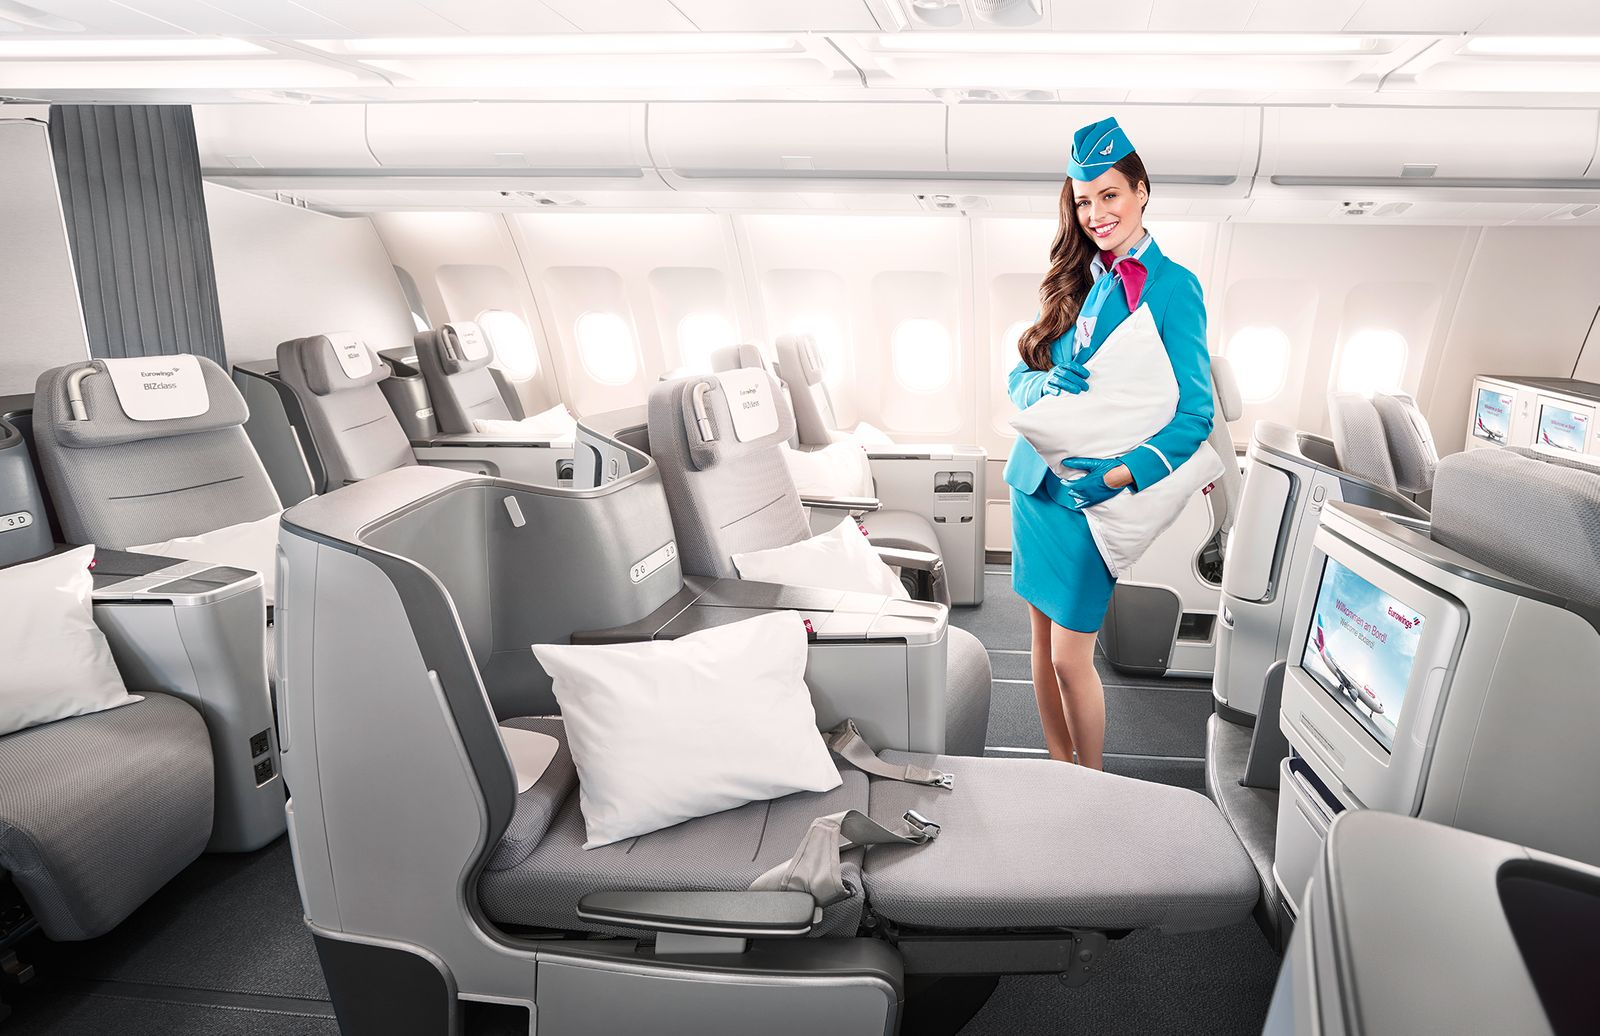 Eurowings BIZclass â Lie-flat Seat